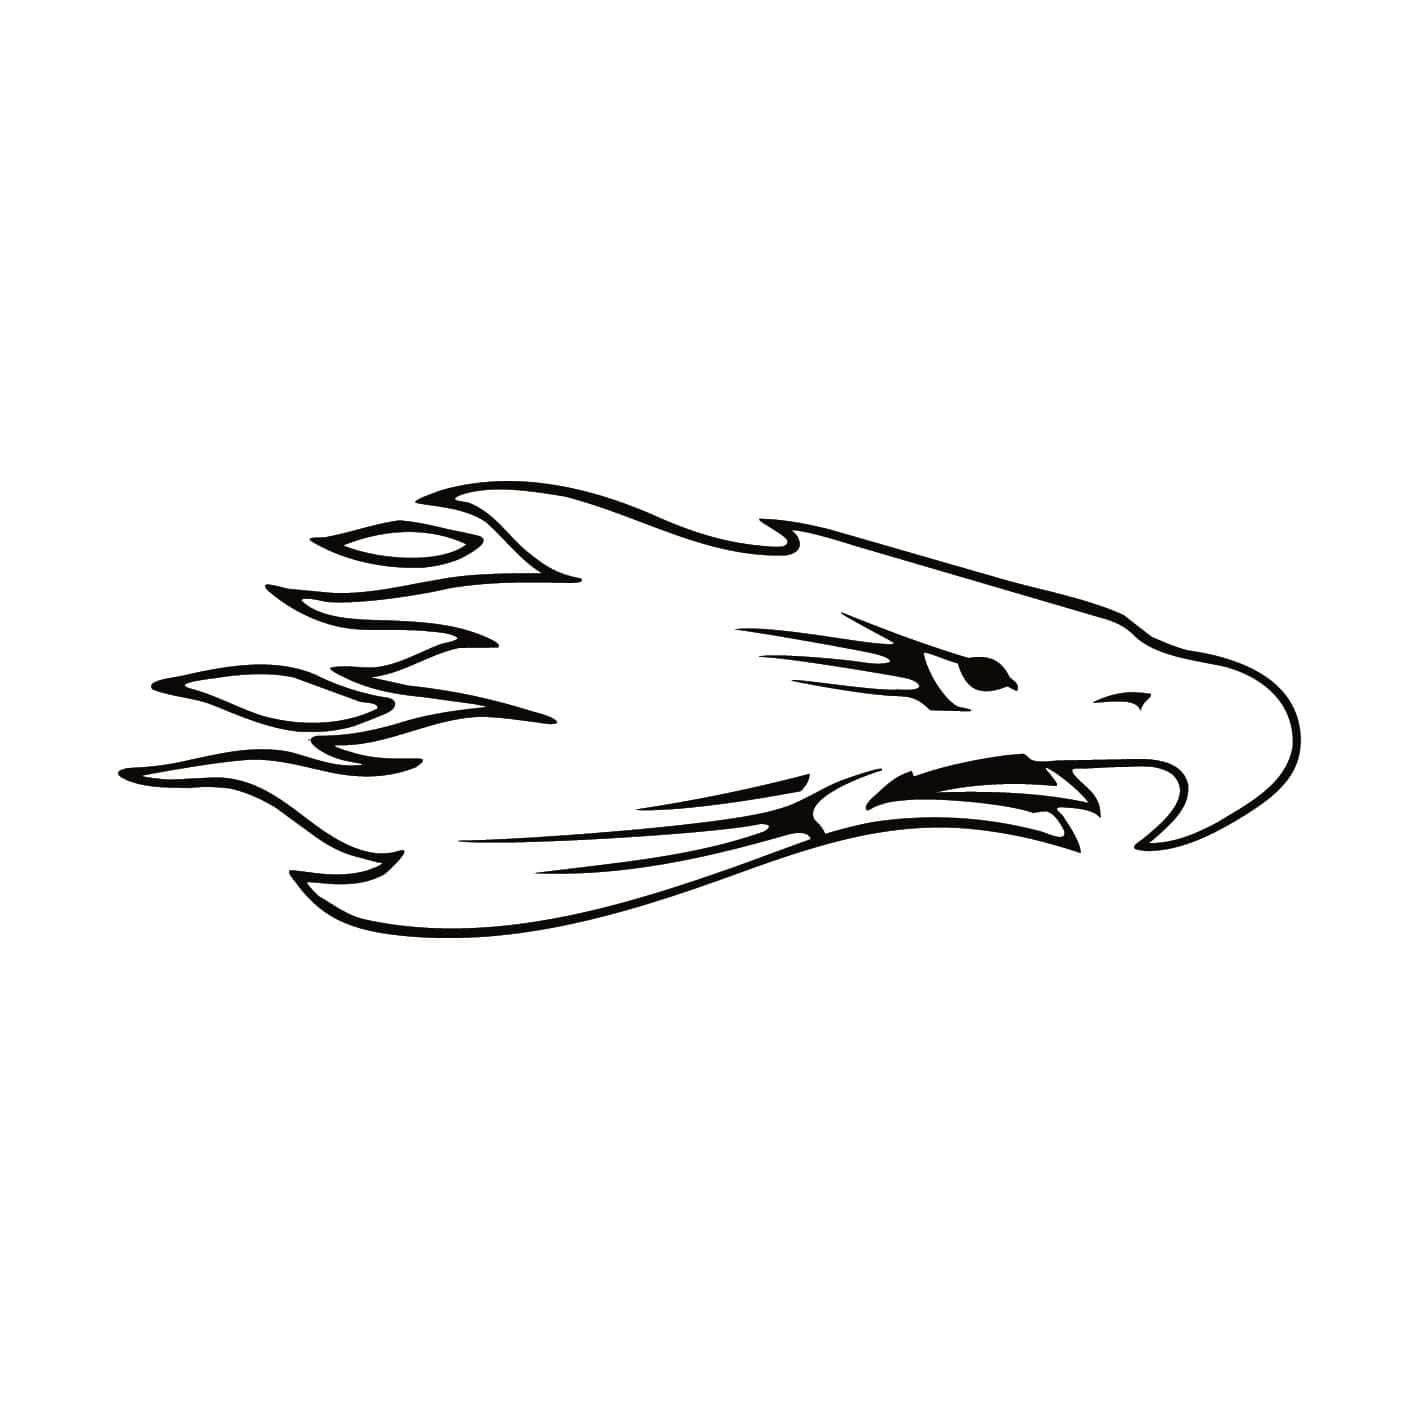 harley-davidson-ref24-tete-d-aigle-stickers-moto-casque-scooter-sticker-autocollant-adhesifs-min